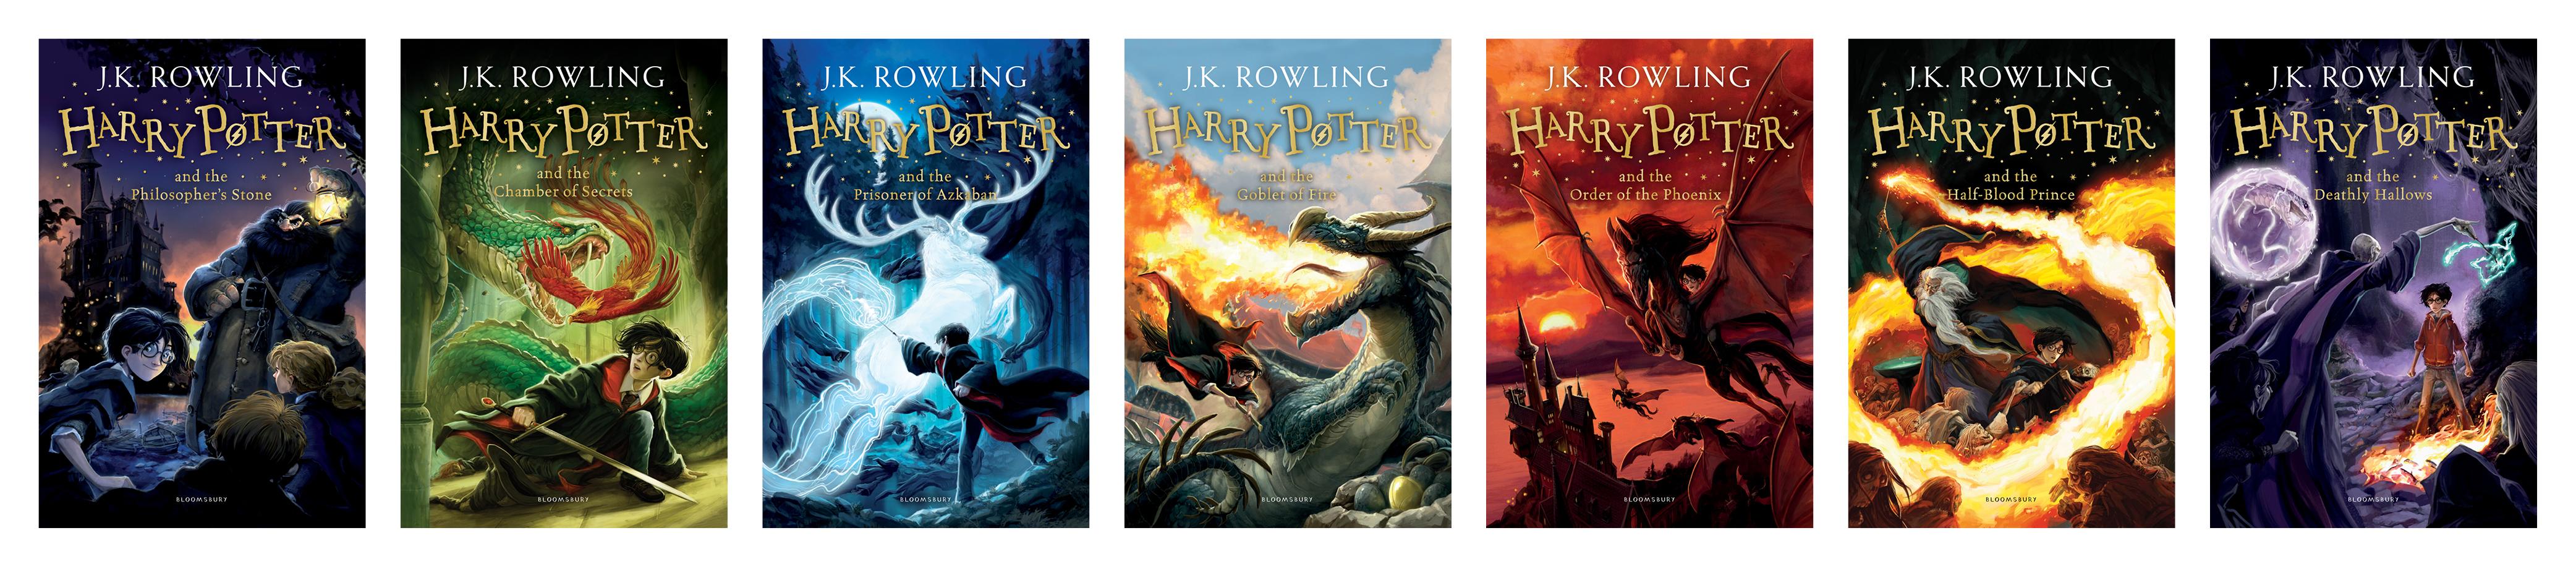 JonnyDuddle-HarryPotter-covers-complete-set